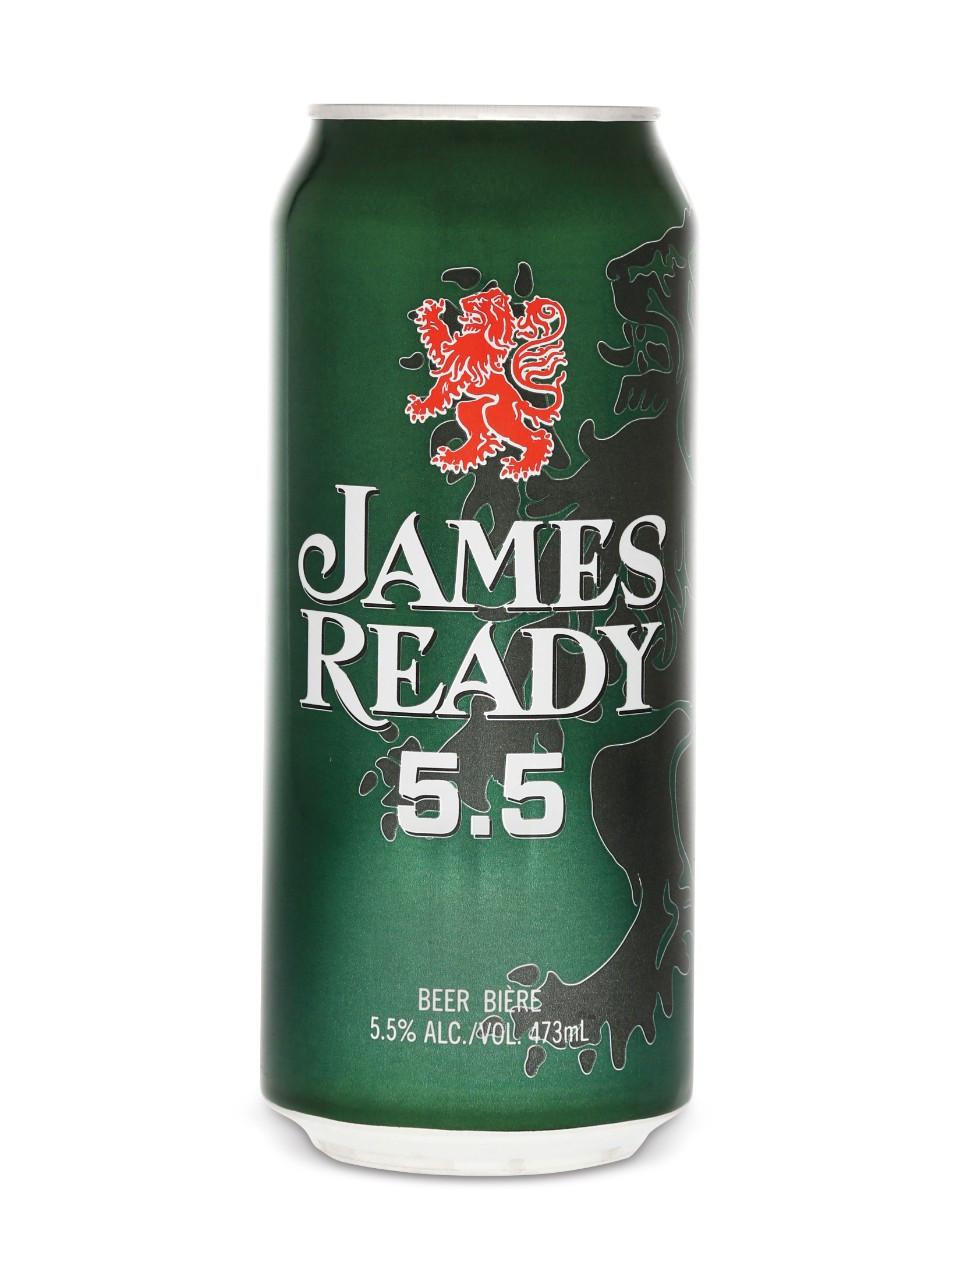 James ready 5.5  6 x 473 ml